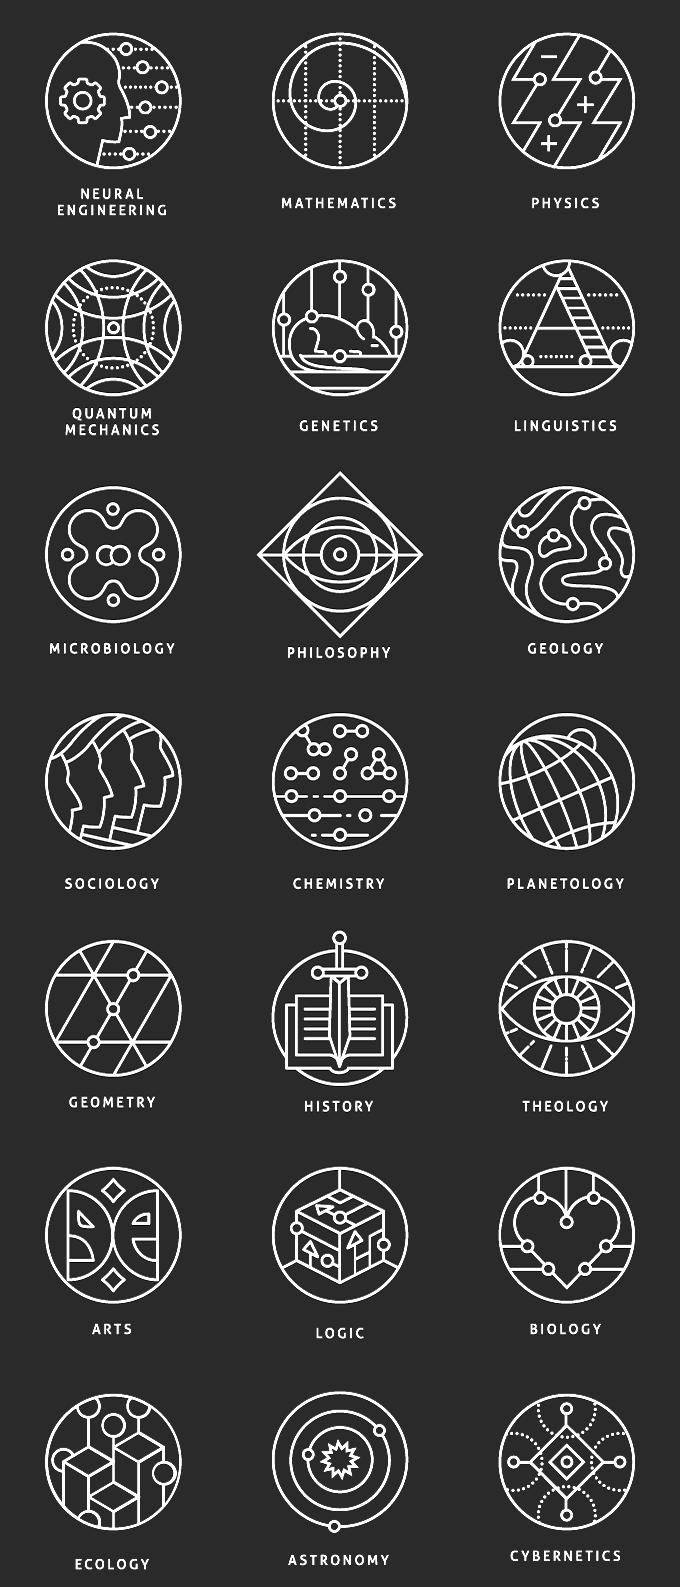 Oleg Stepanov tattoo inspiration Pinterest Tattoo Symbols and